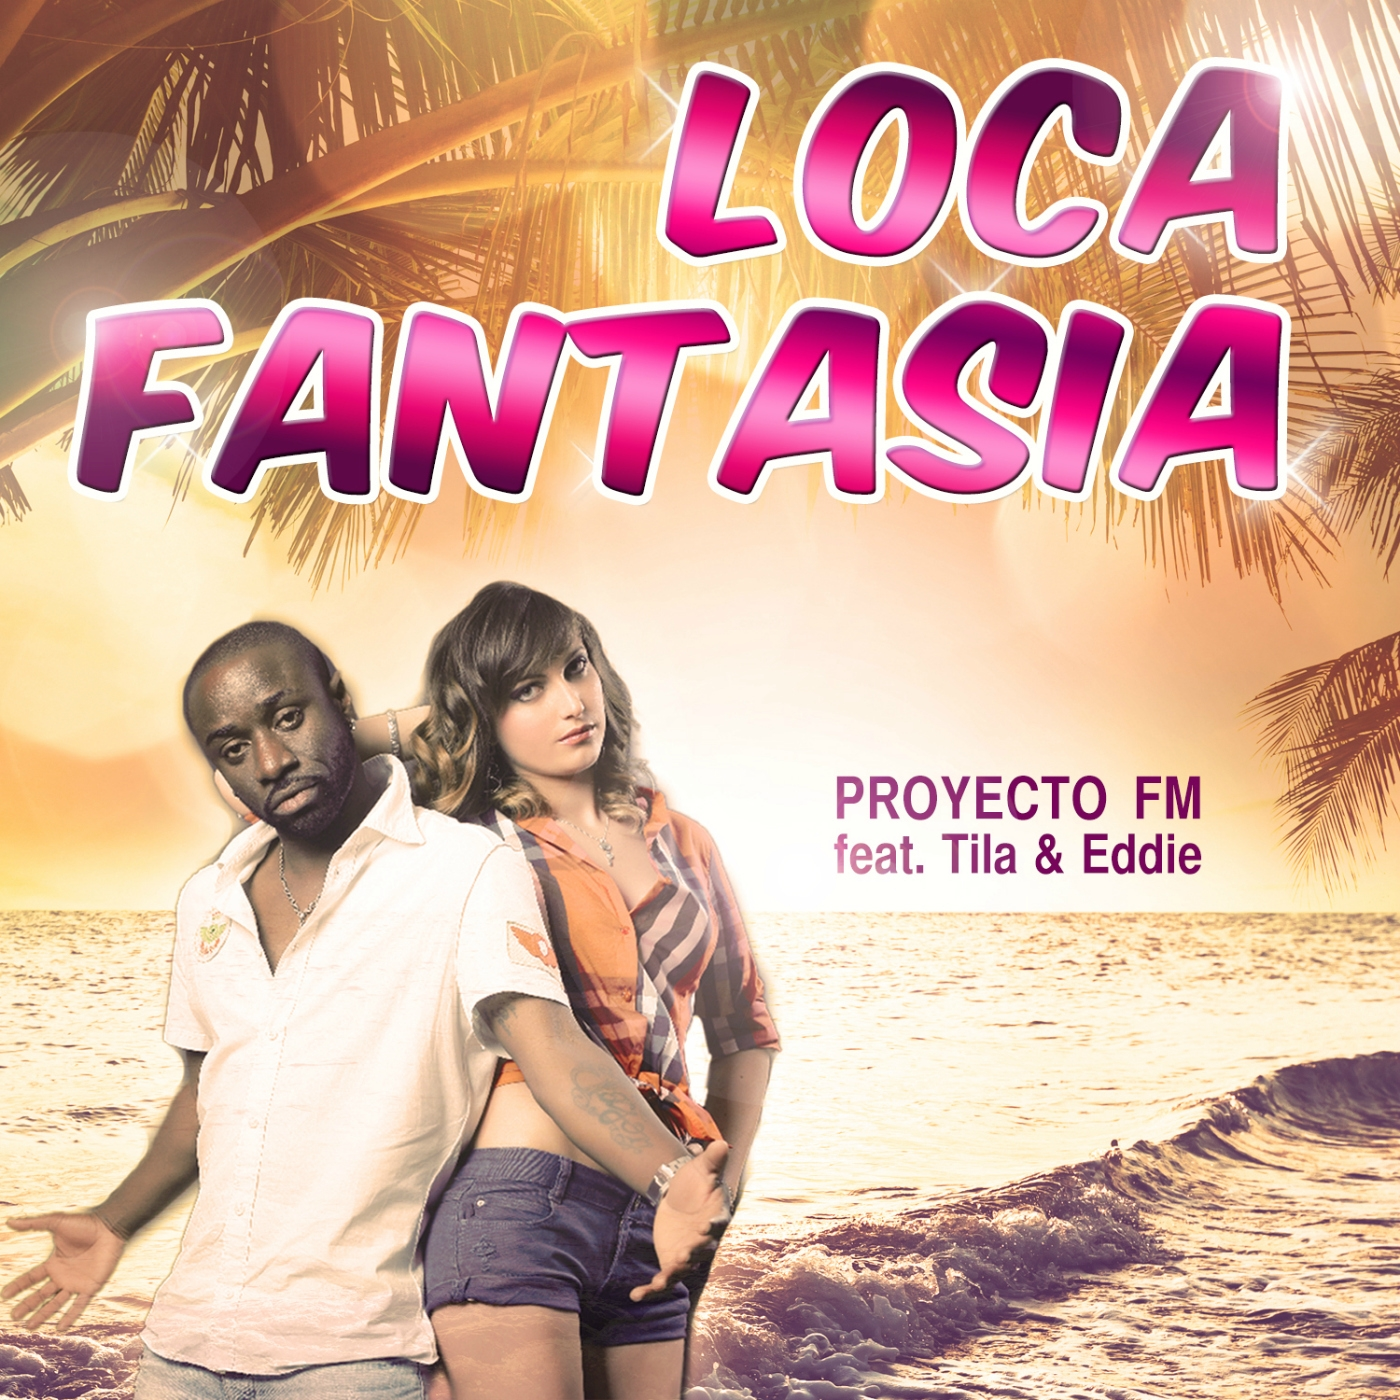 Proyecto FM - Loca Fantasia Feat. Tila & Eddie (Matthew Bee Club Mix)